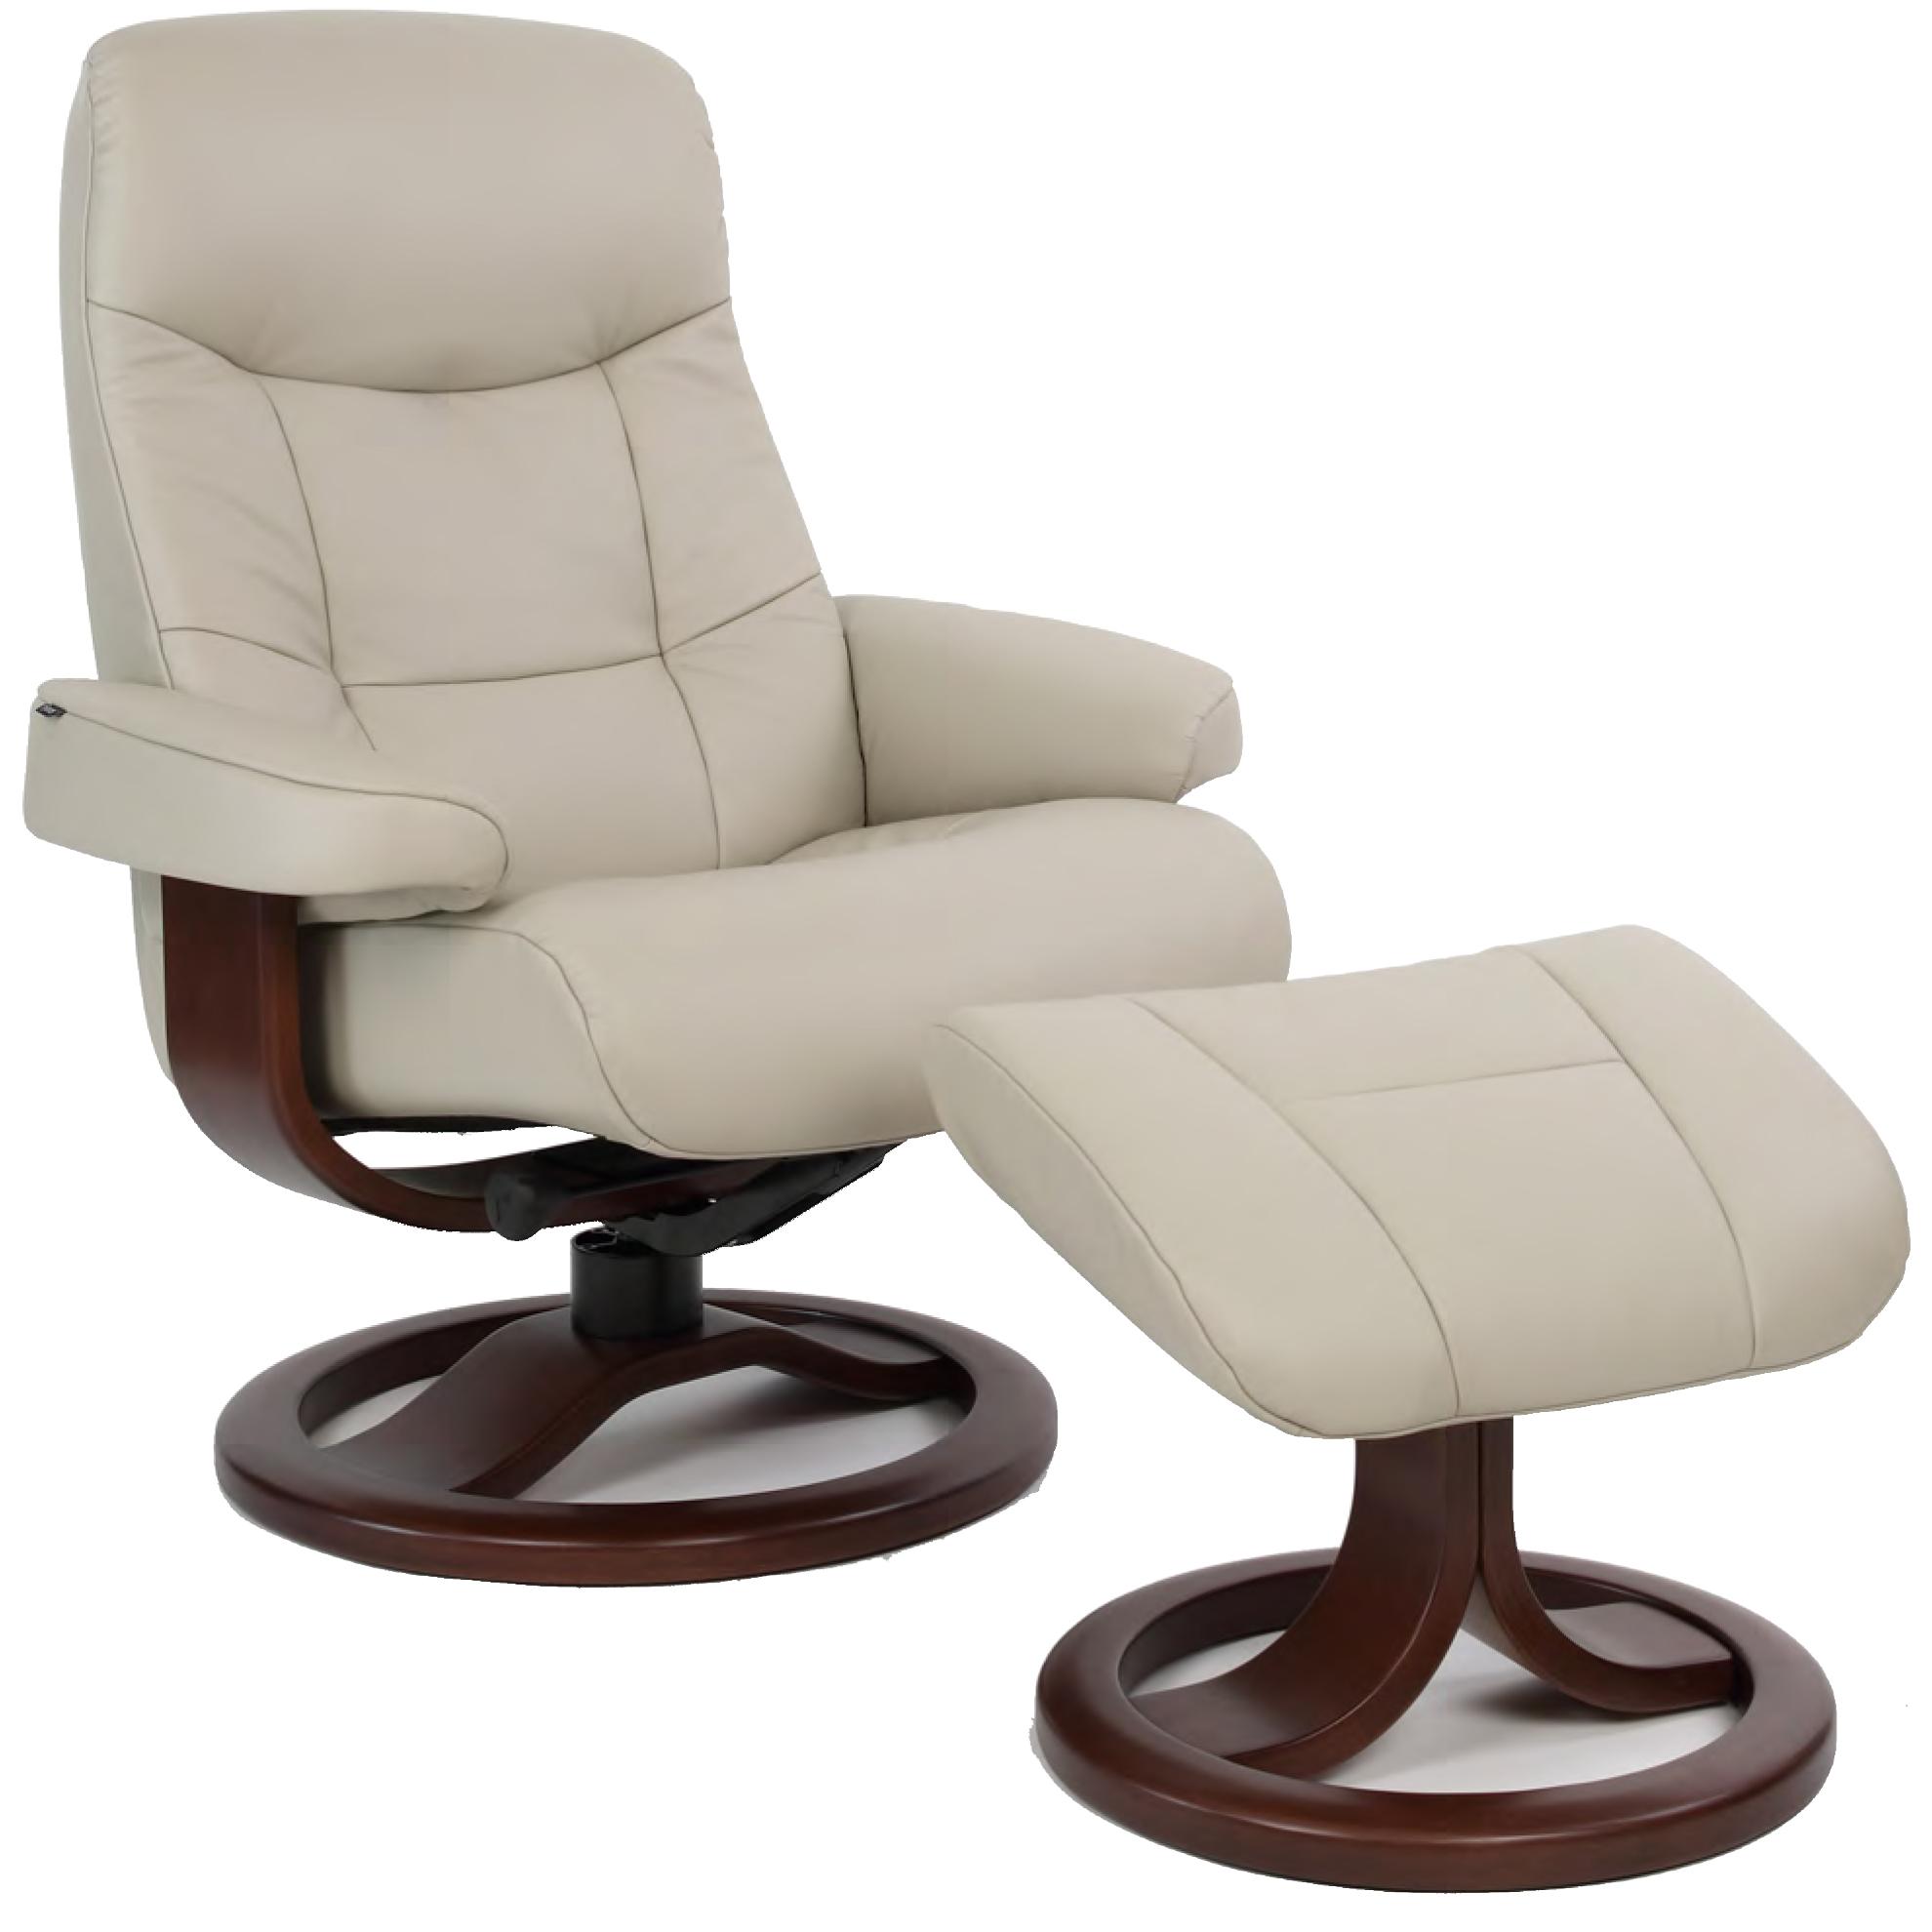 the perfect chair ergonomic zero gravity recliner chair